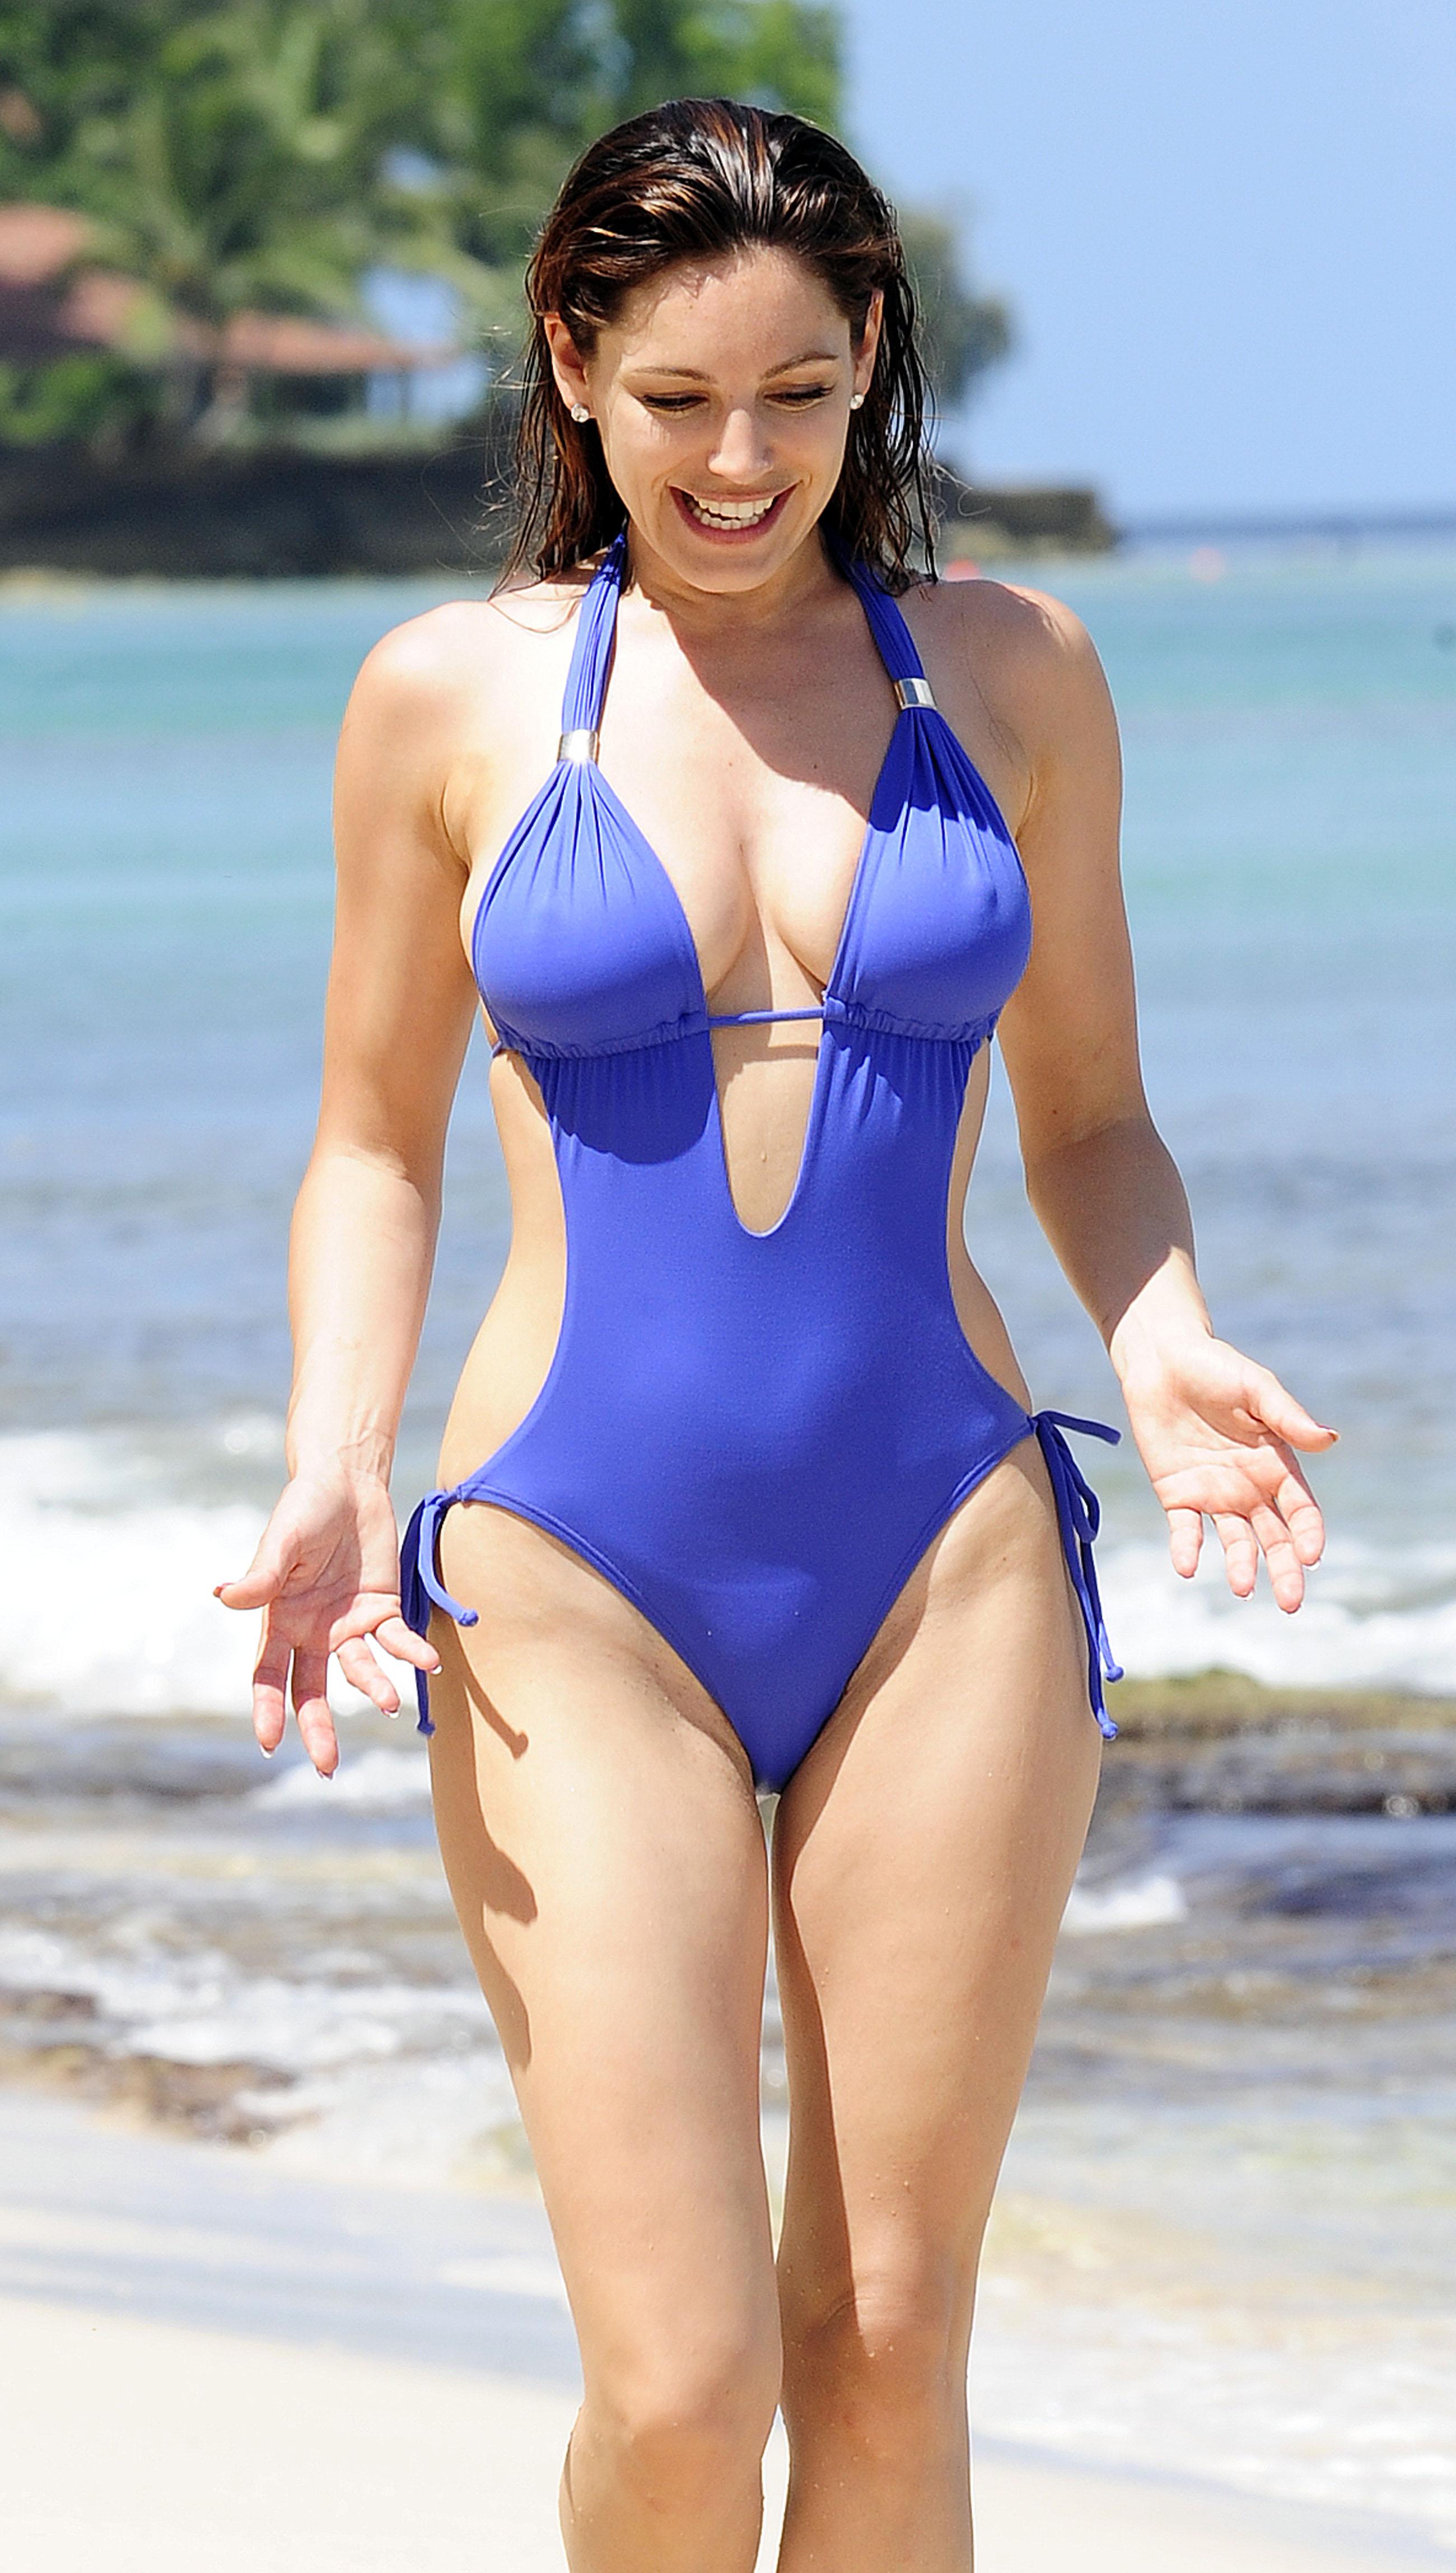 51479_Kelly_Brook_On_The_Beach_In_Barbados.10_HQ_009_122_570lo.jpg